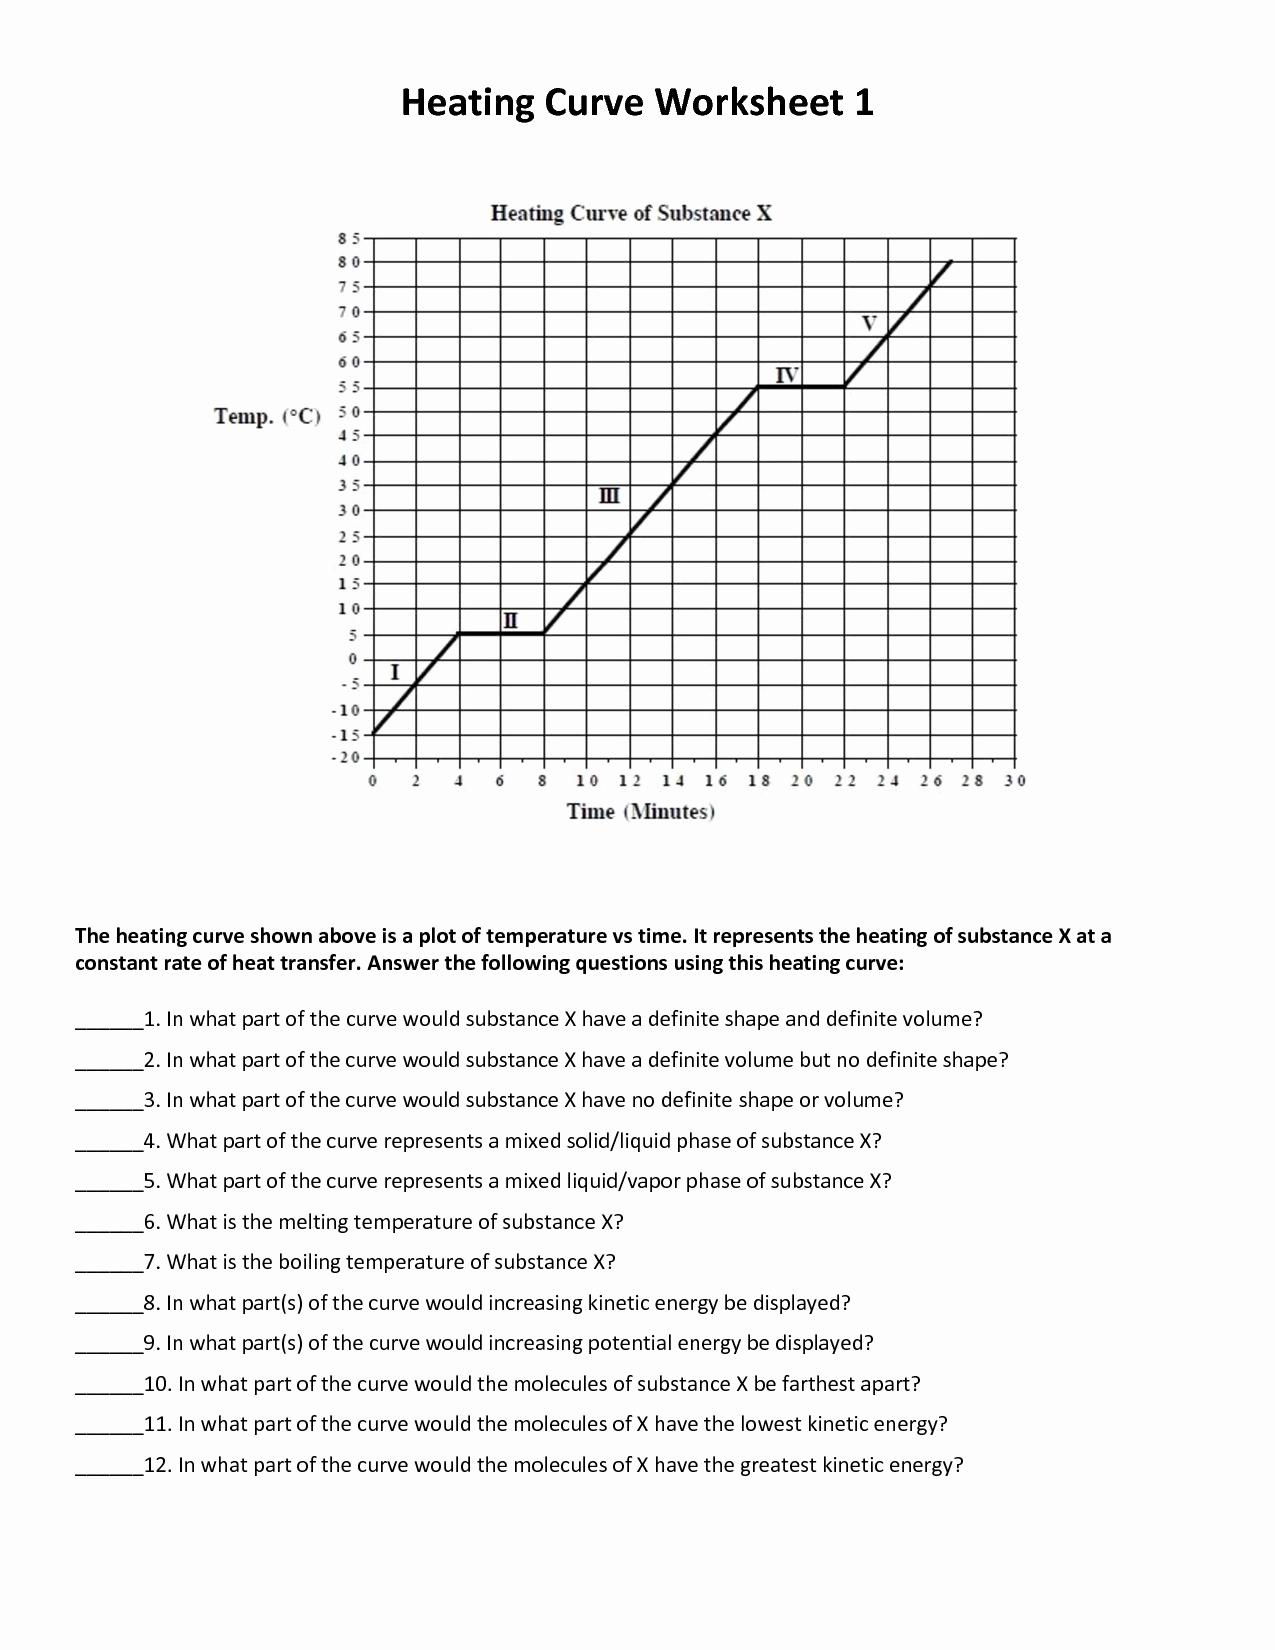 Heating Curve Worksheet Answers Luxury 1st Quarter Robert E Lee Chemistry